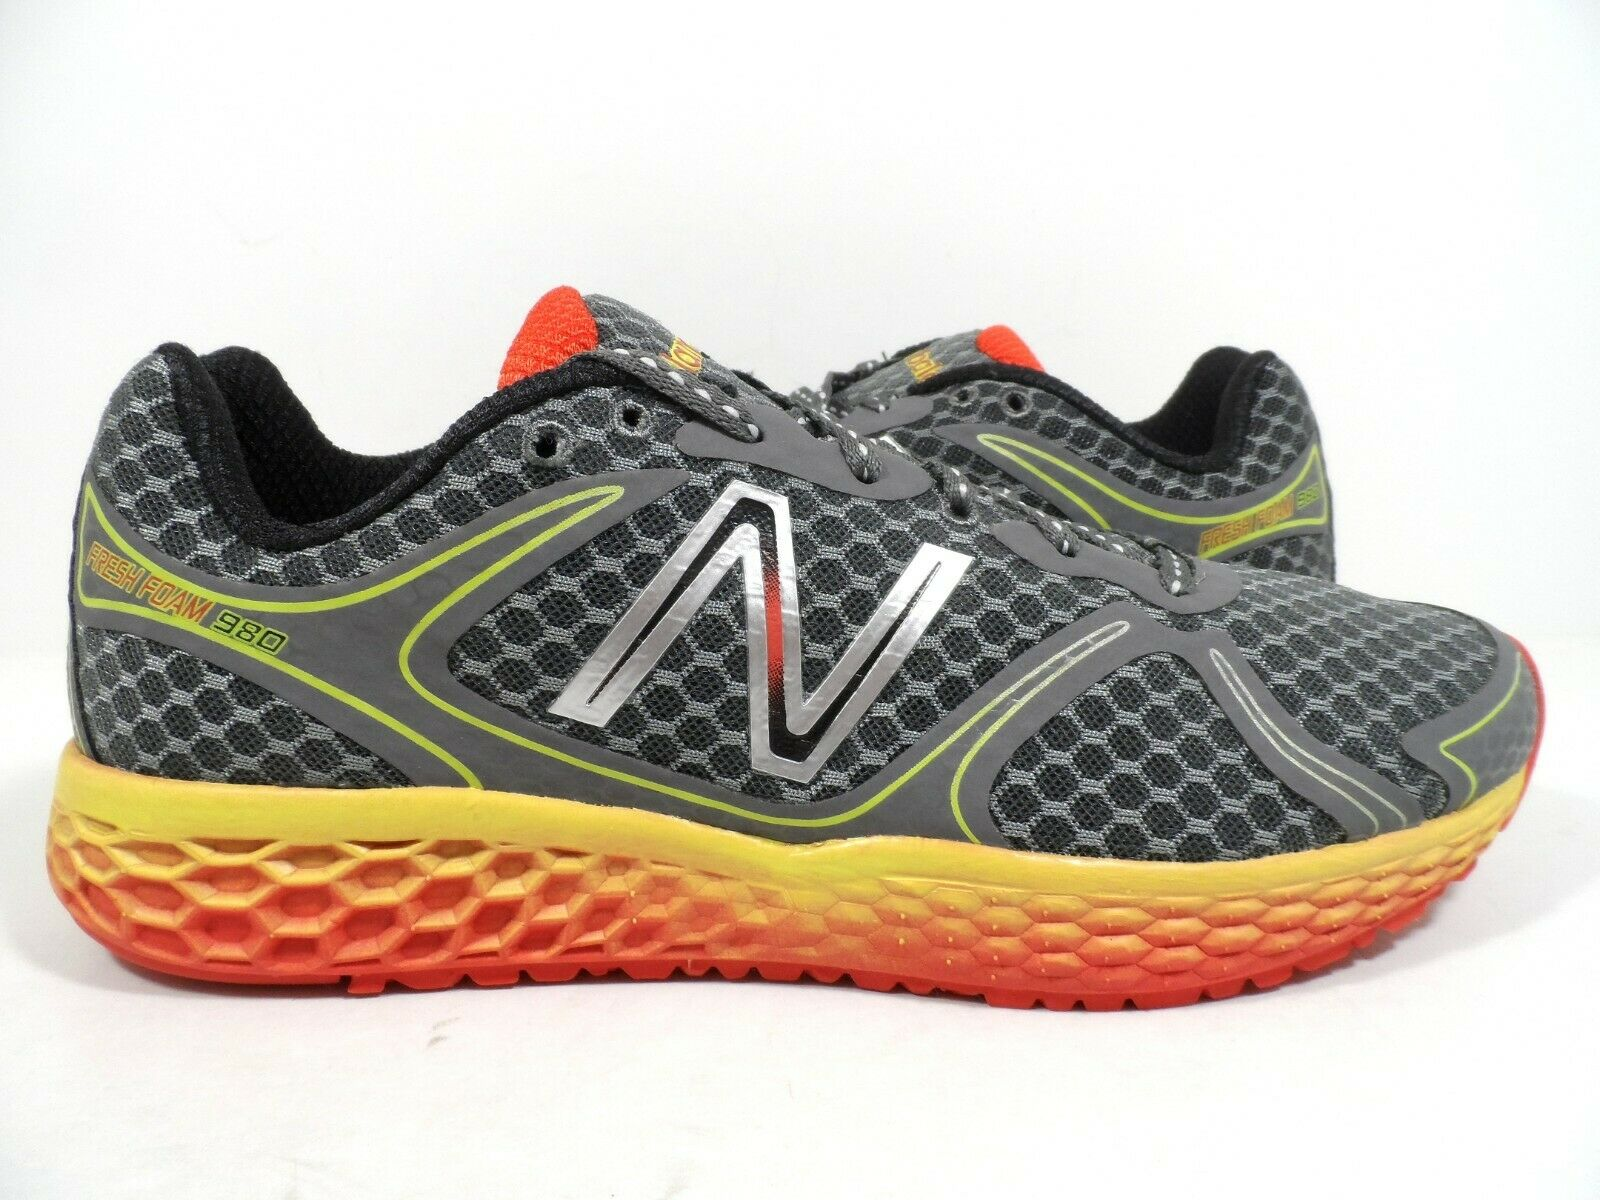 Para Hombre M980V1 Fresh New Balance Foam Calzado para Correr gris naranja tamaño 9.5